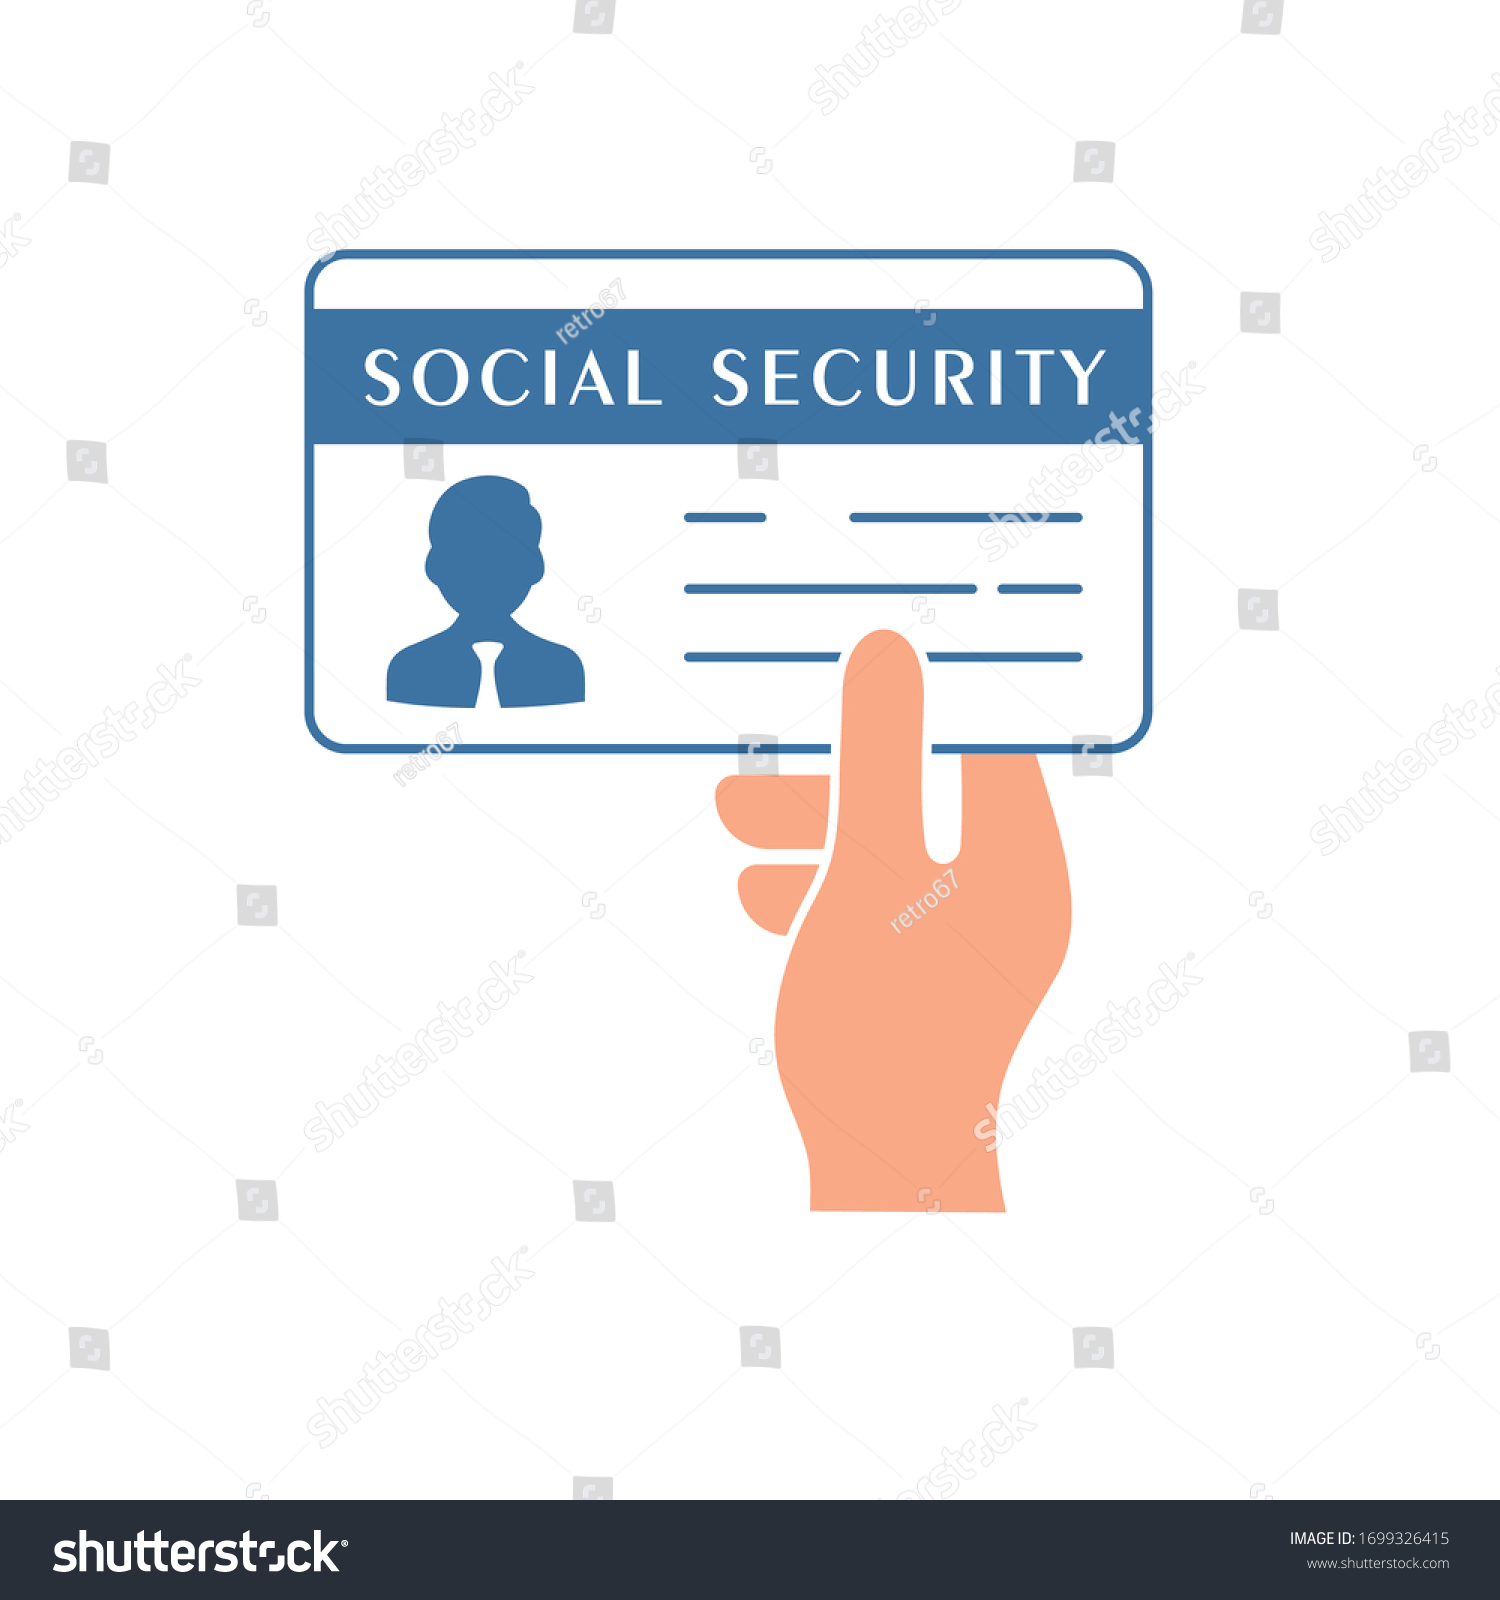 Social Security Card Vector Illustration Flat Stock Vector Royalty Free 1699326415